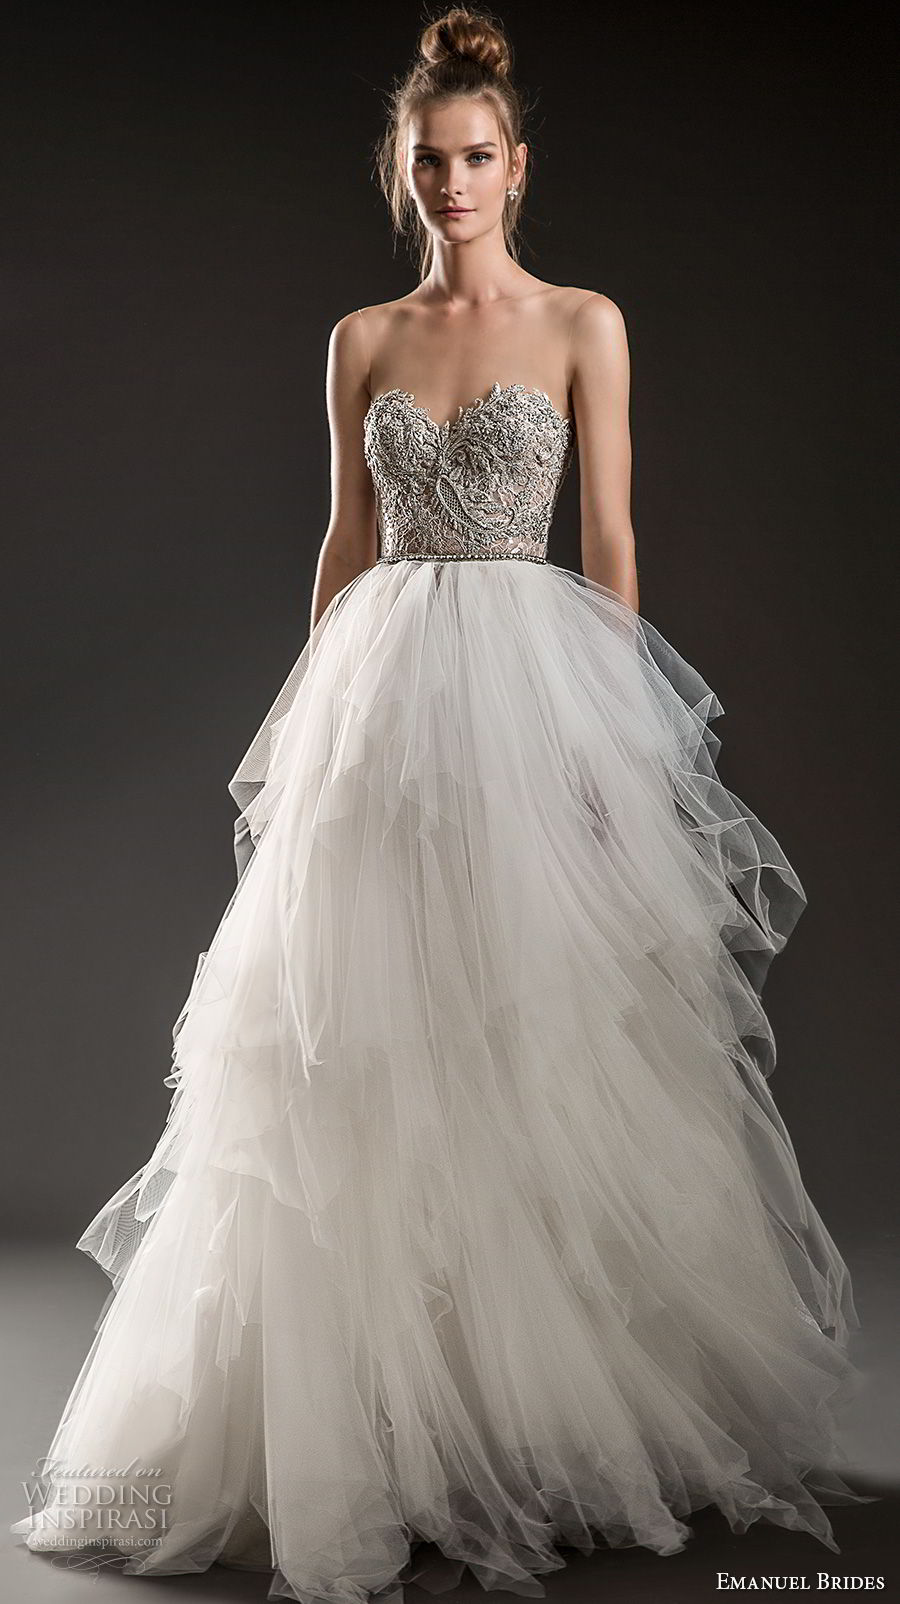 emanuel brides 2018 bridal strapless sweetheart neckline heavily embellished bodice tulle layered skirt romantic glamorous a  line wedding dress sweep train (04) mv